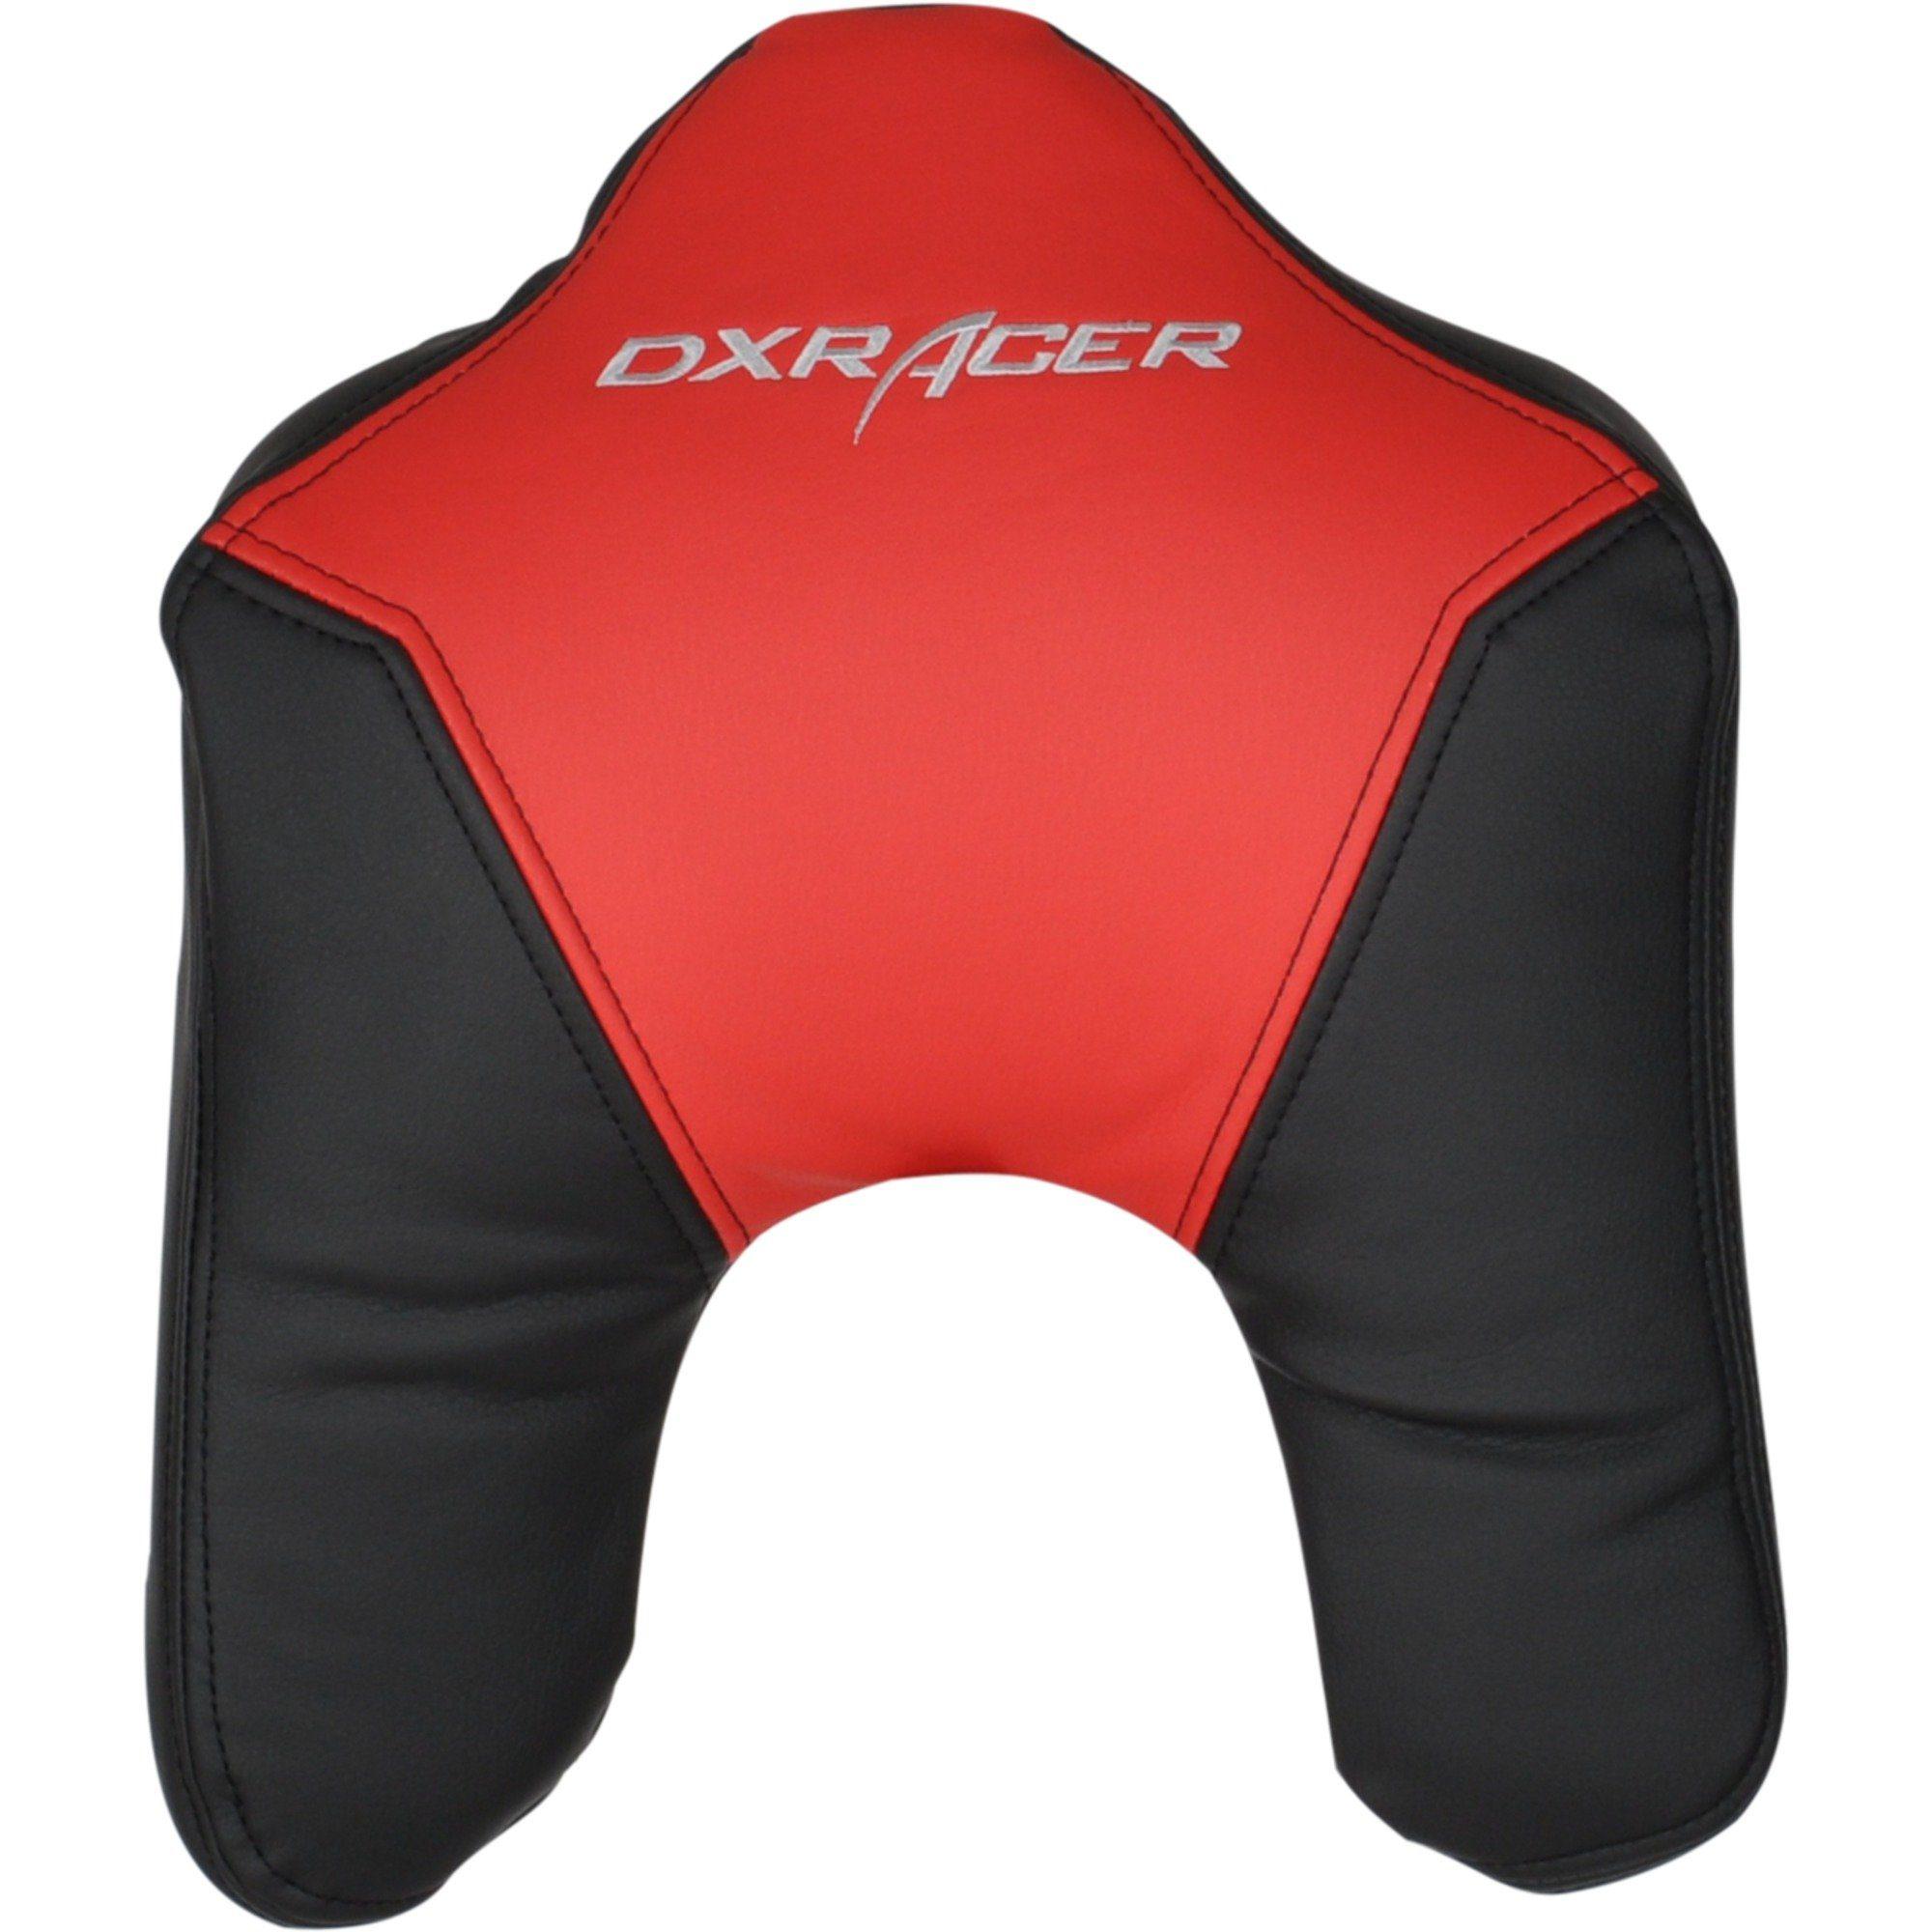 DXRacer Kopfstütze »Headrest Cushion«